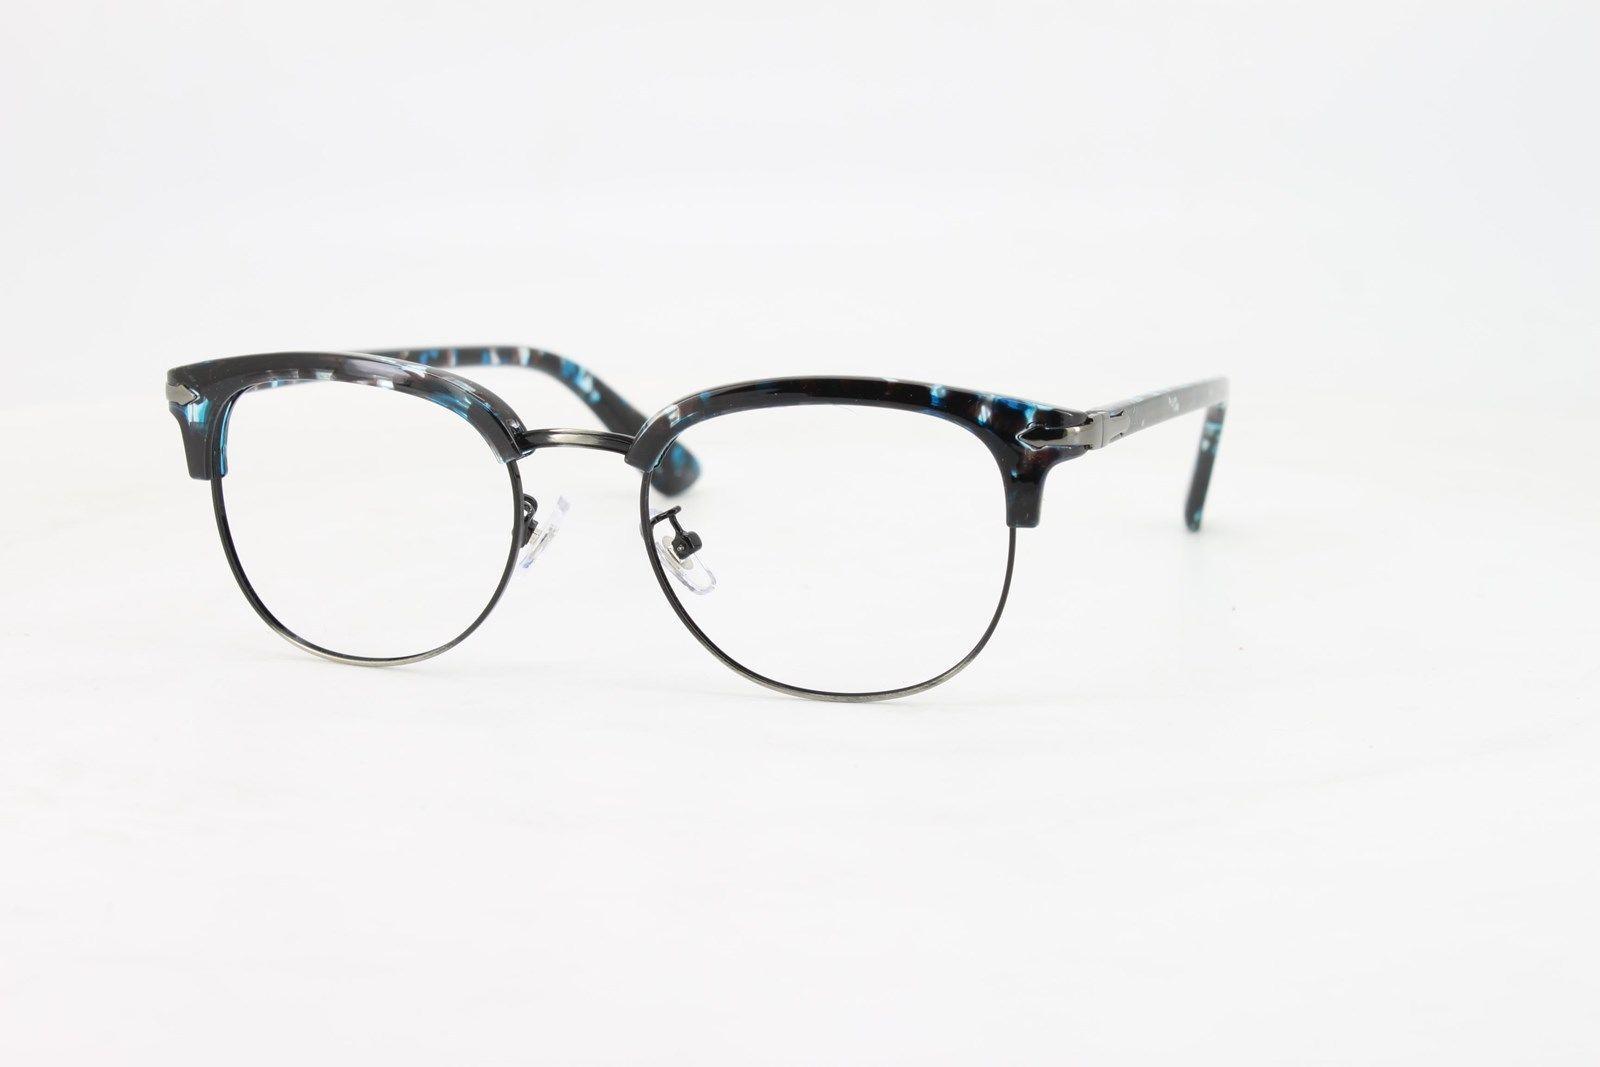 bc9e9848306 Ebe Bifocal Reading Glasses Mens Womens Blue and 50 similar items. S l1600